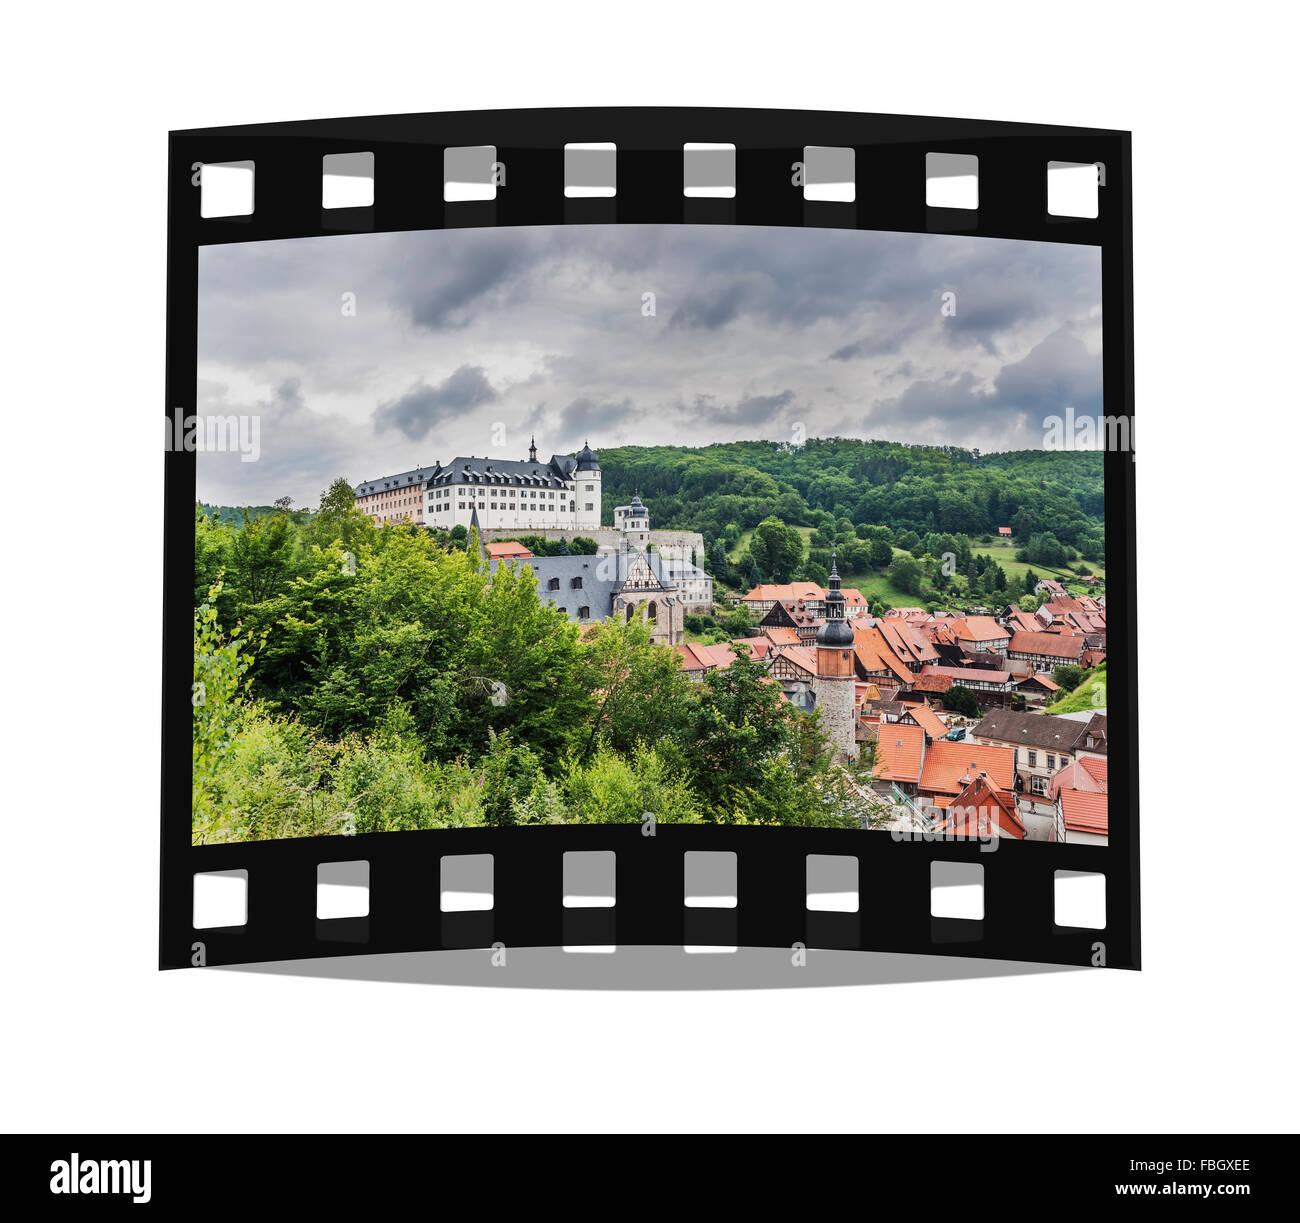 Castle Stolberg/Harz, municipality Suedharz, Mansfeld-Suedharz, Saxony-Anhalt, Germany, Europe - Stock Image